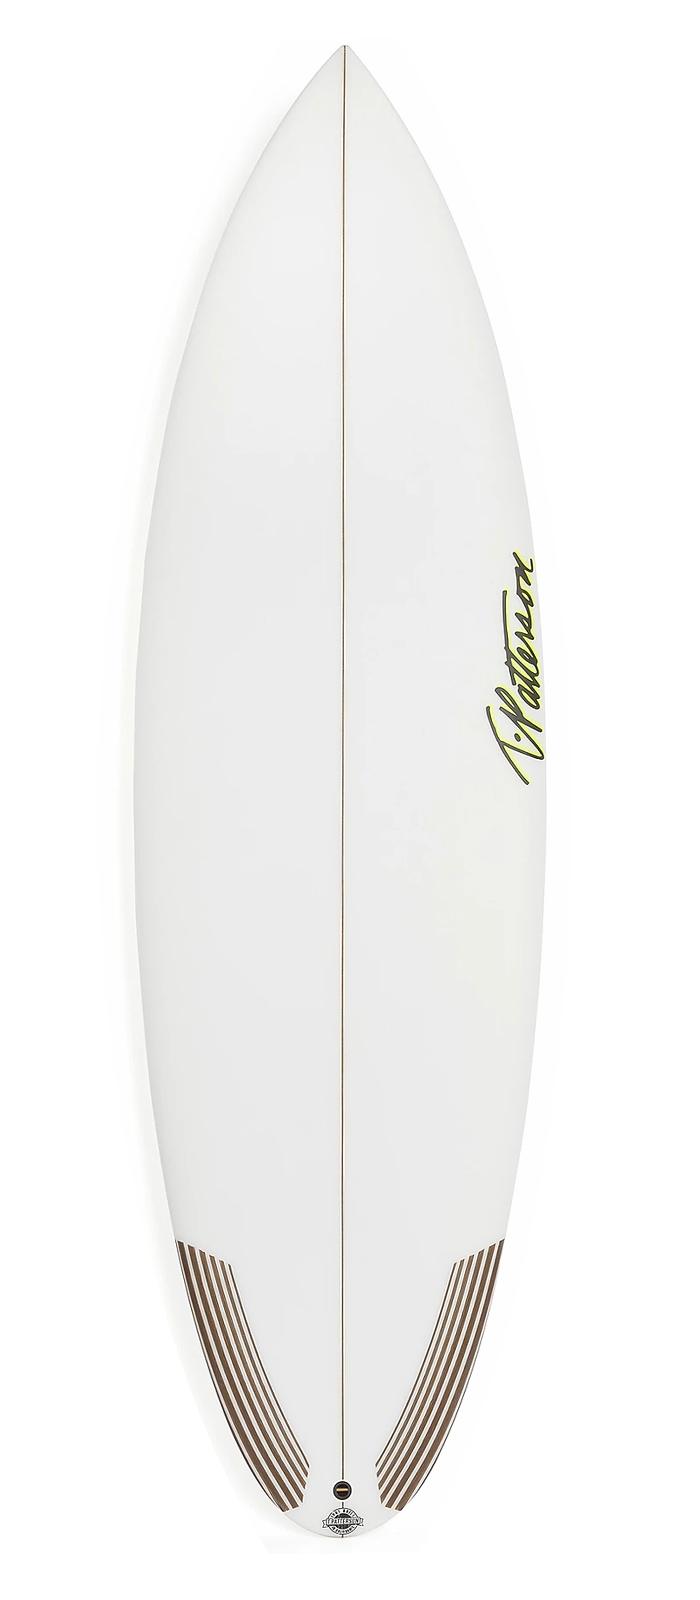 NEW SUN surfboard model